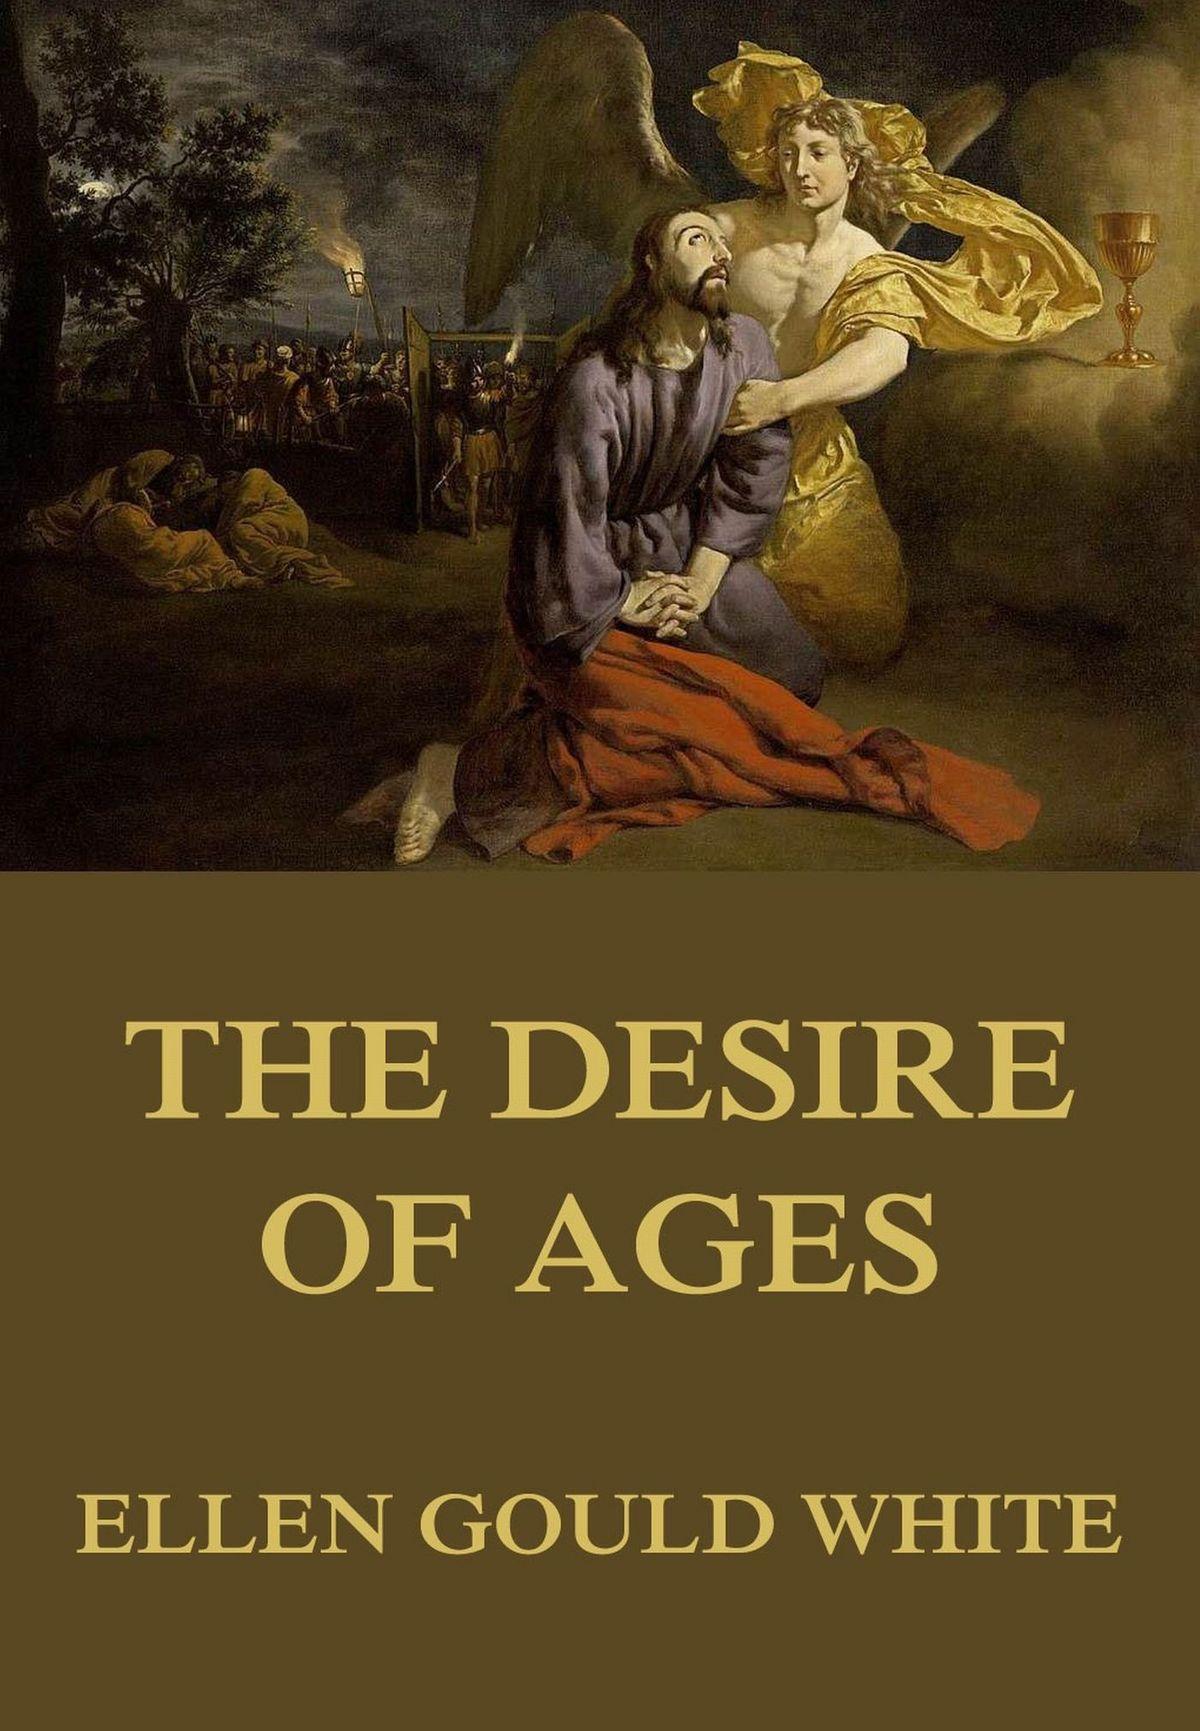 The Desire of Ages: Khangtawn Lunggulh - Nunneem Zeisu by Ellen G White and translated by Suan Khen Go into Zokam, Zolai, Zopau, Tedim, Chin, Paite, Thado